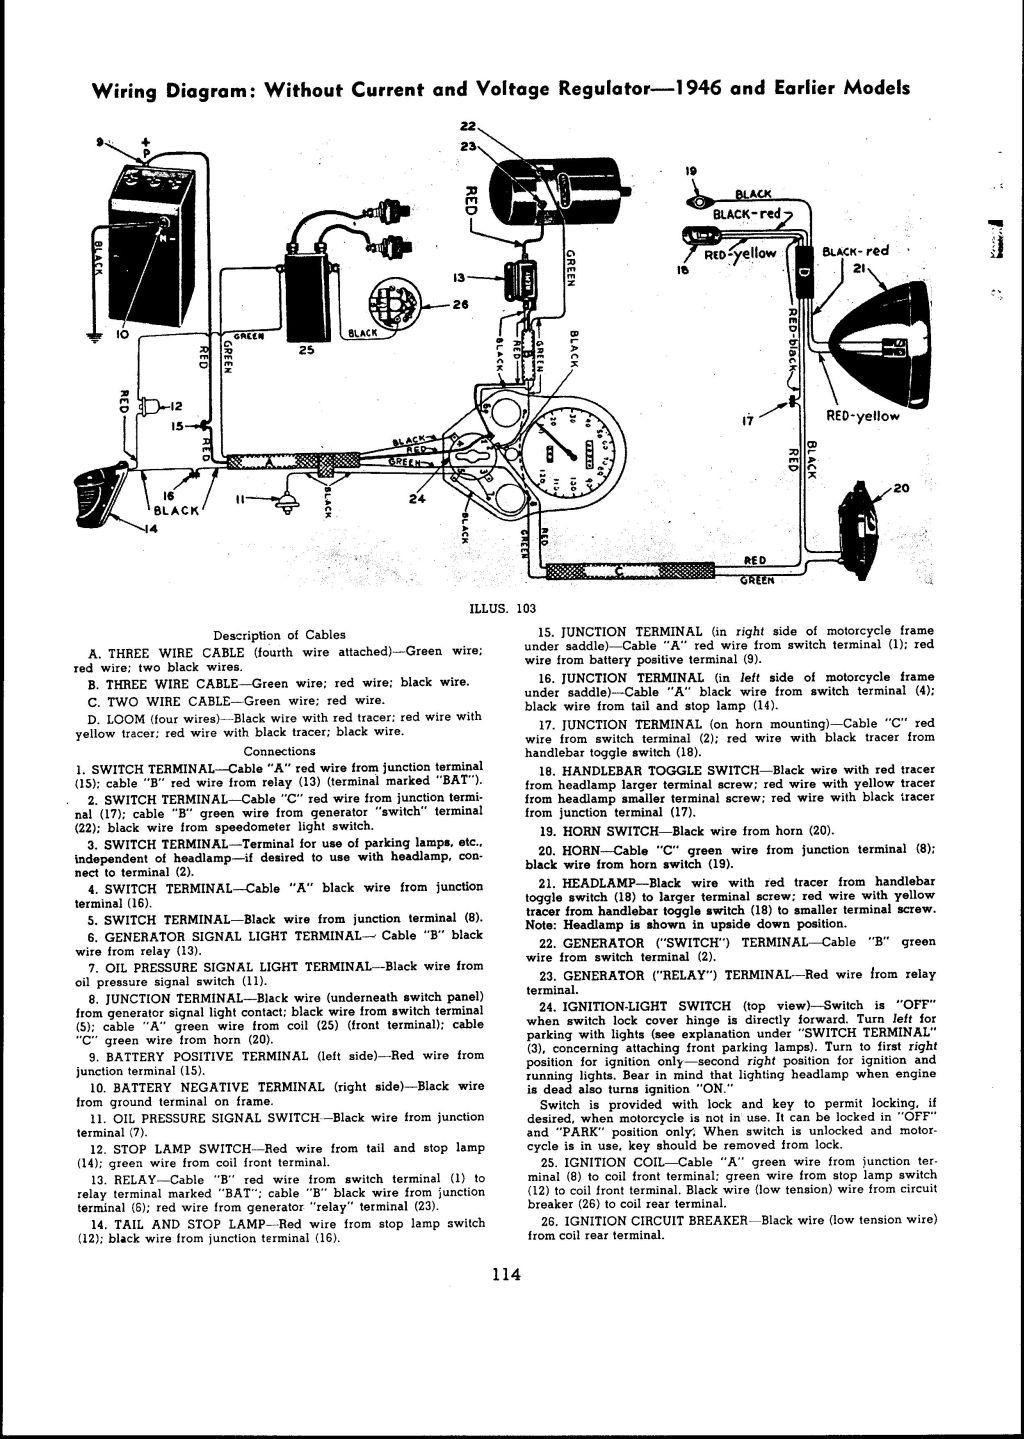 1941 harley davidson wl restoration re wiring the harley davidson wl harley dash oil light wiring [ 1024 x 1439 Pixel ]